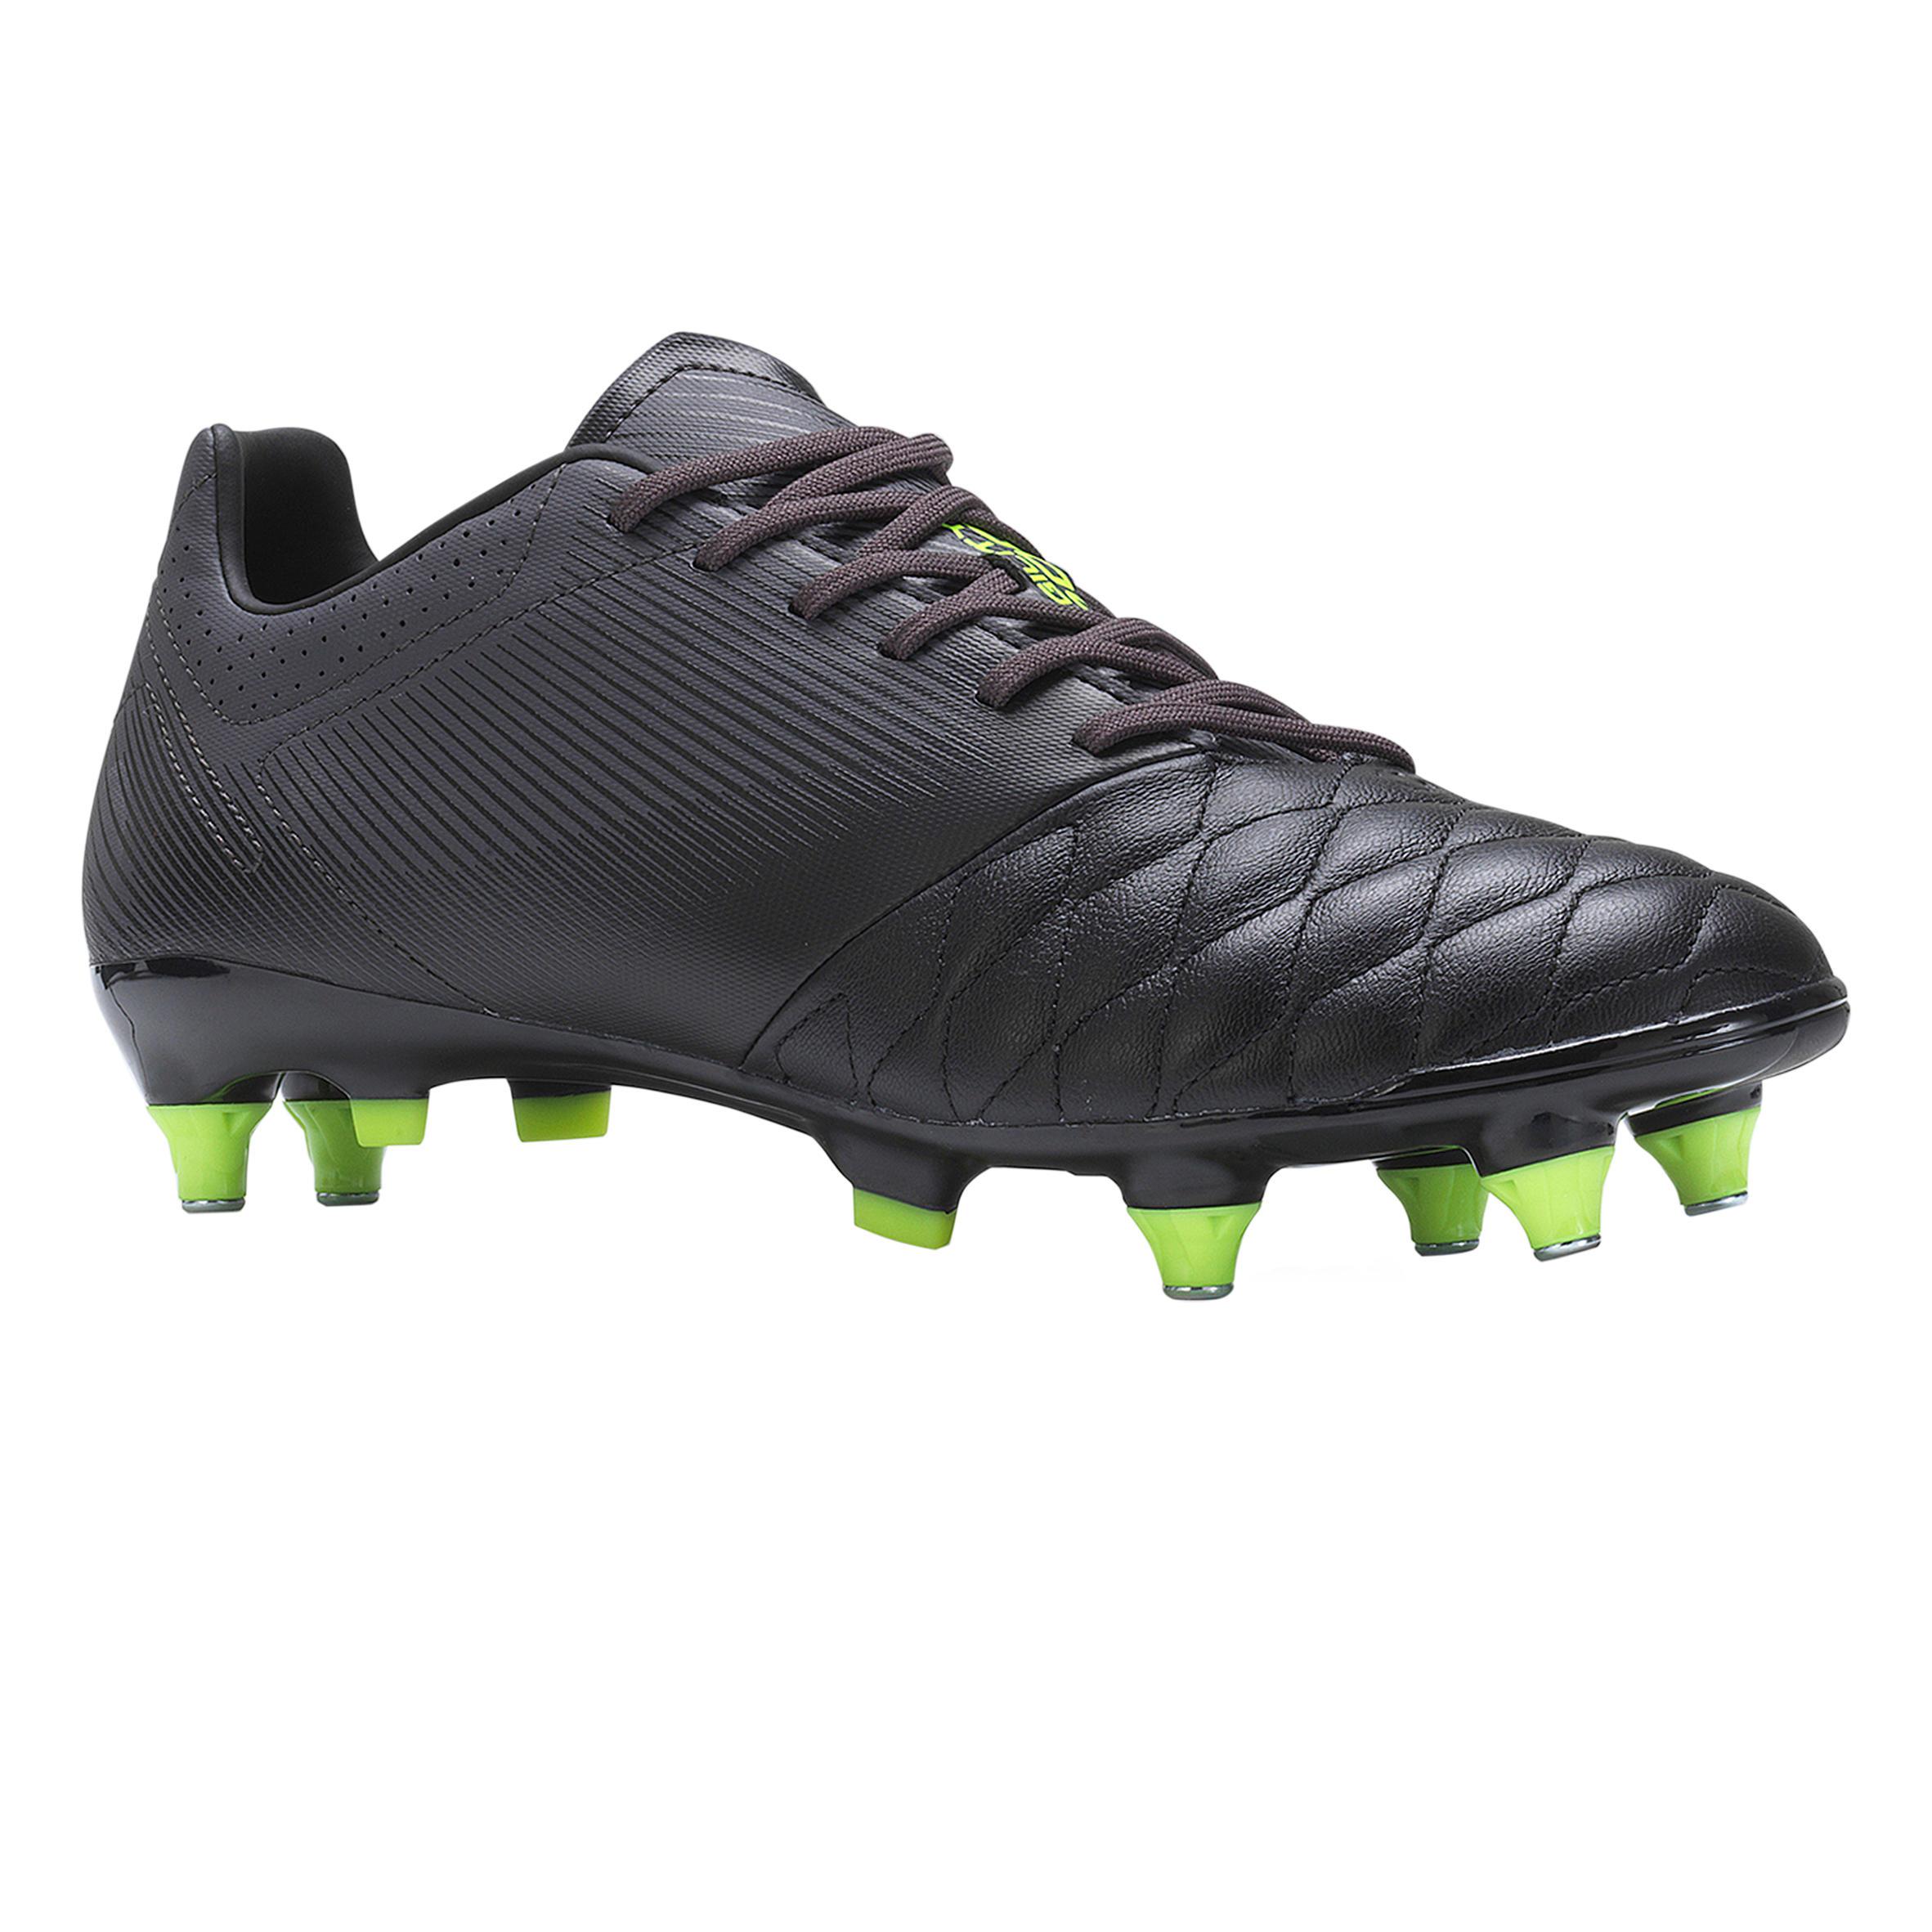 Fußballschuhe Stollen Agility 540 SG Leder Erwachsene | Schuhe > Sportschuhe > Fußballschuhe | Kipsta